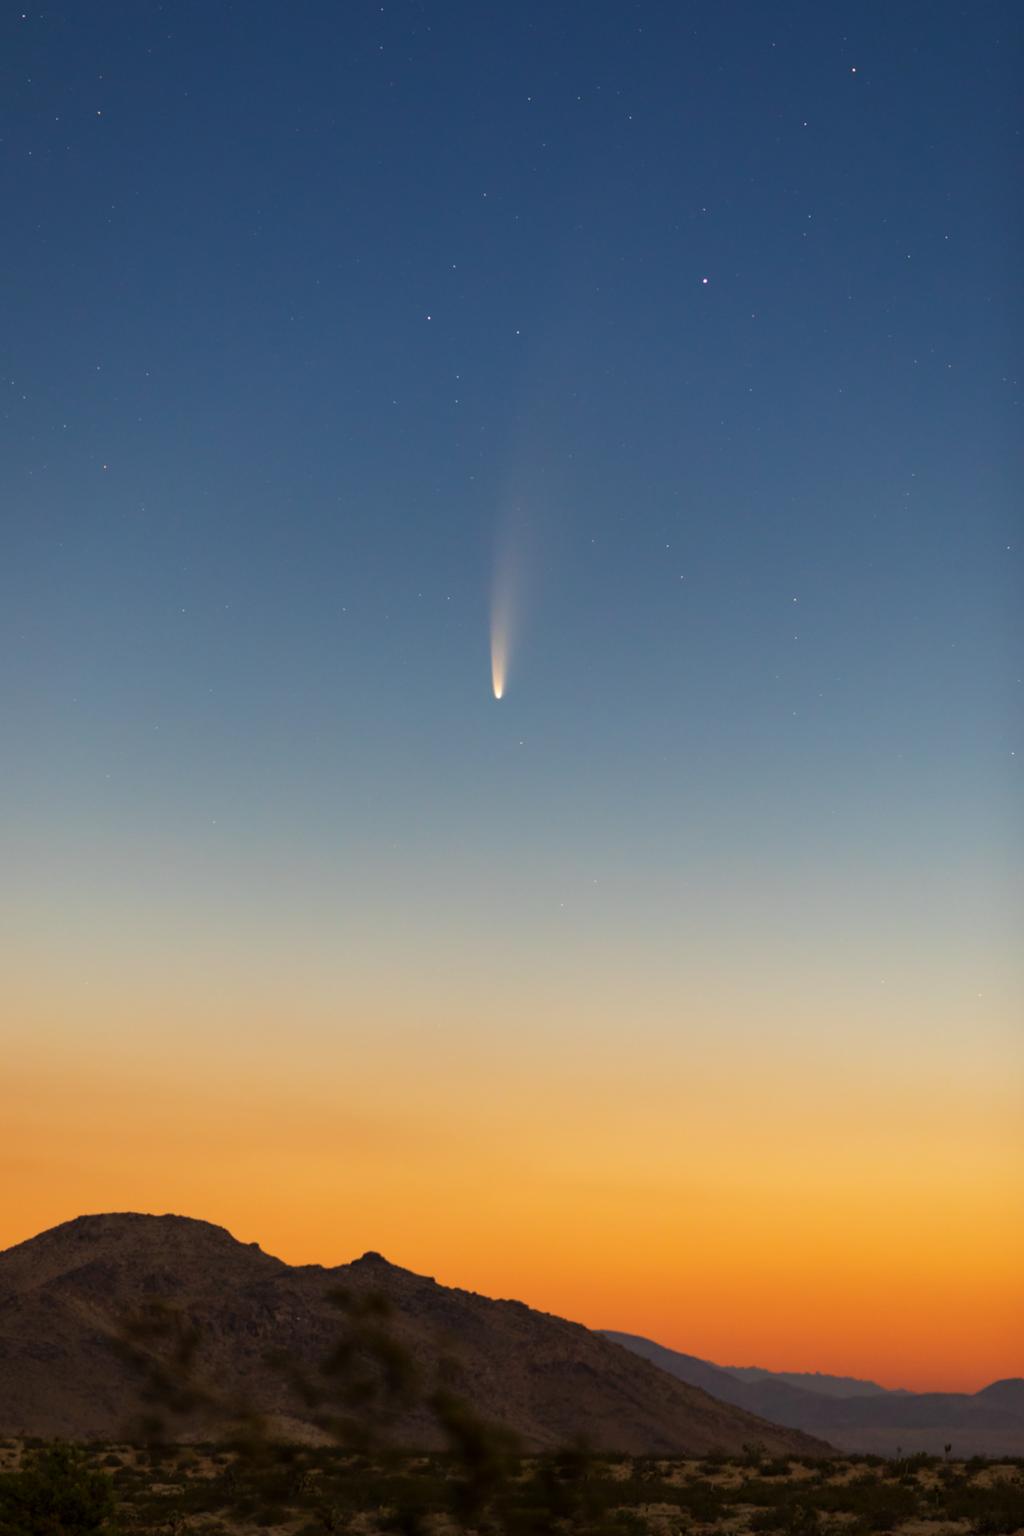 comet c f neowise over california desert landscape